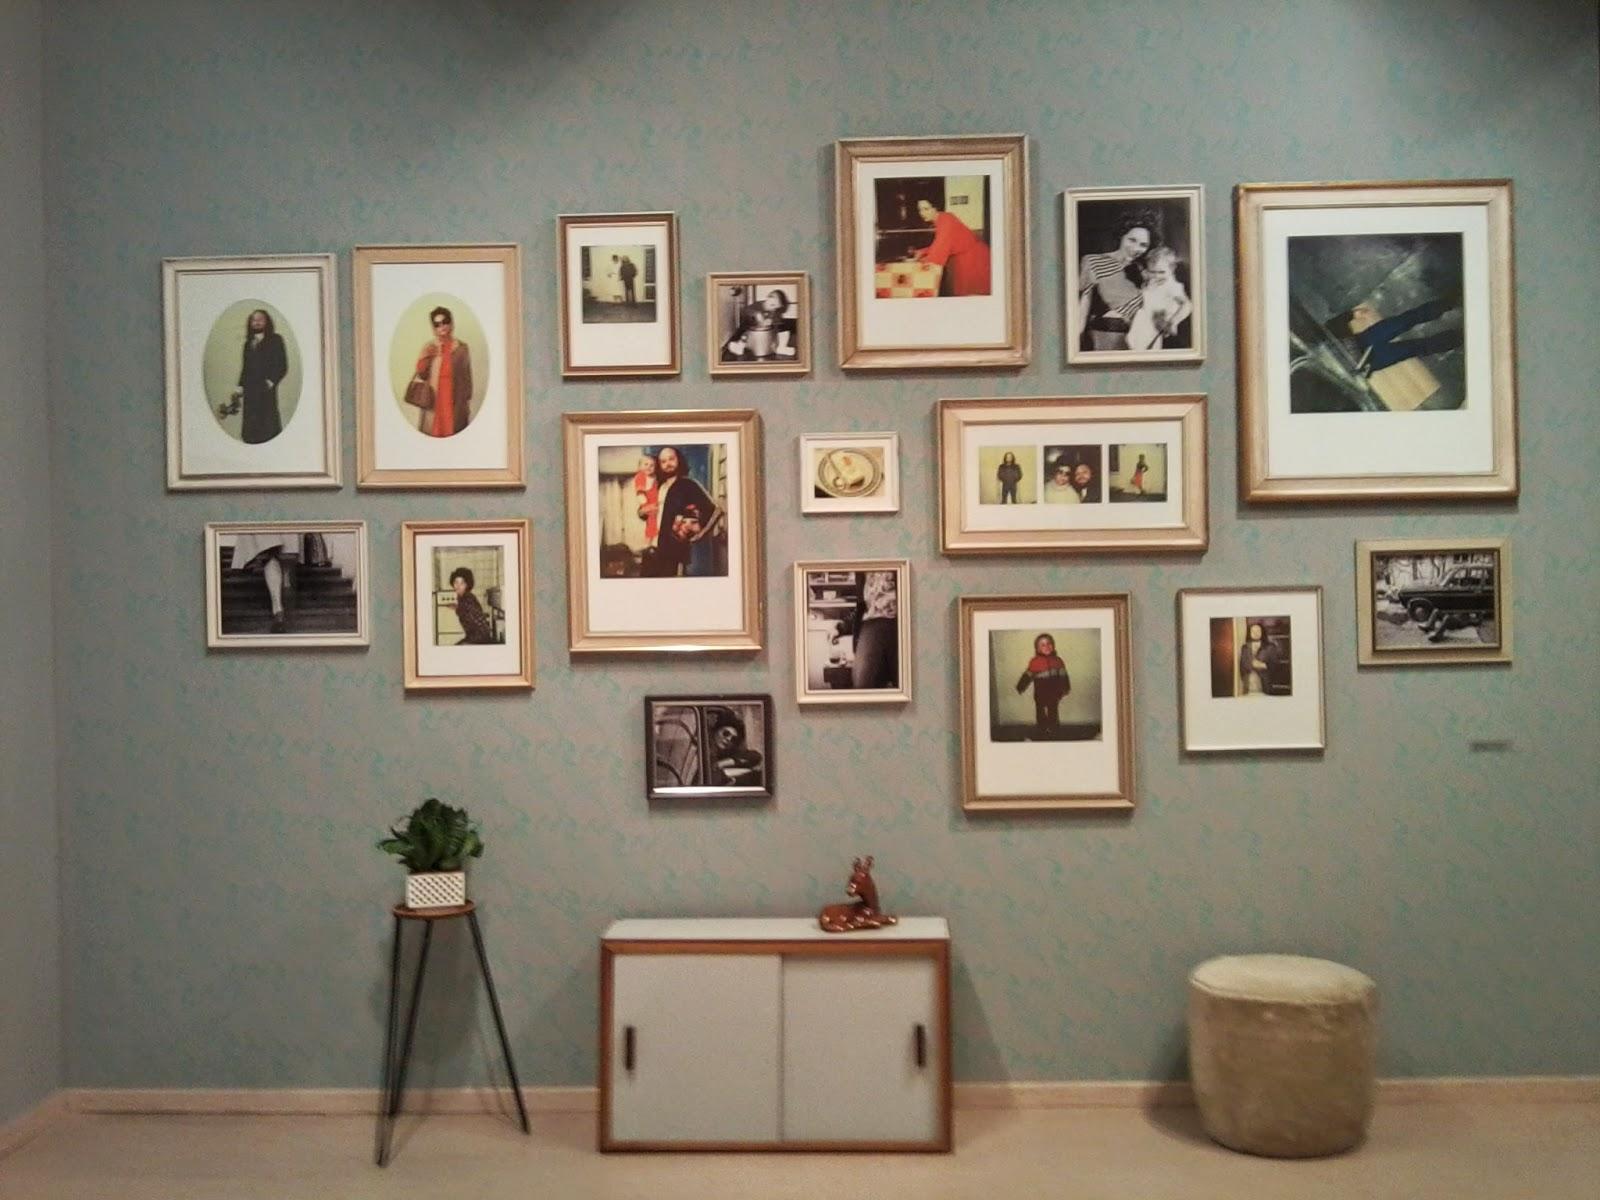 Arte, Arte contemporáneo, Exposiciones Madrid, Blog de Arte, Voa-Gallery, Yvonne Brochard, Leica Gallery,